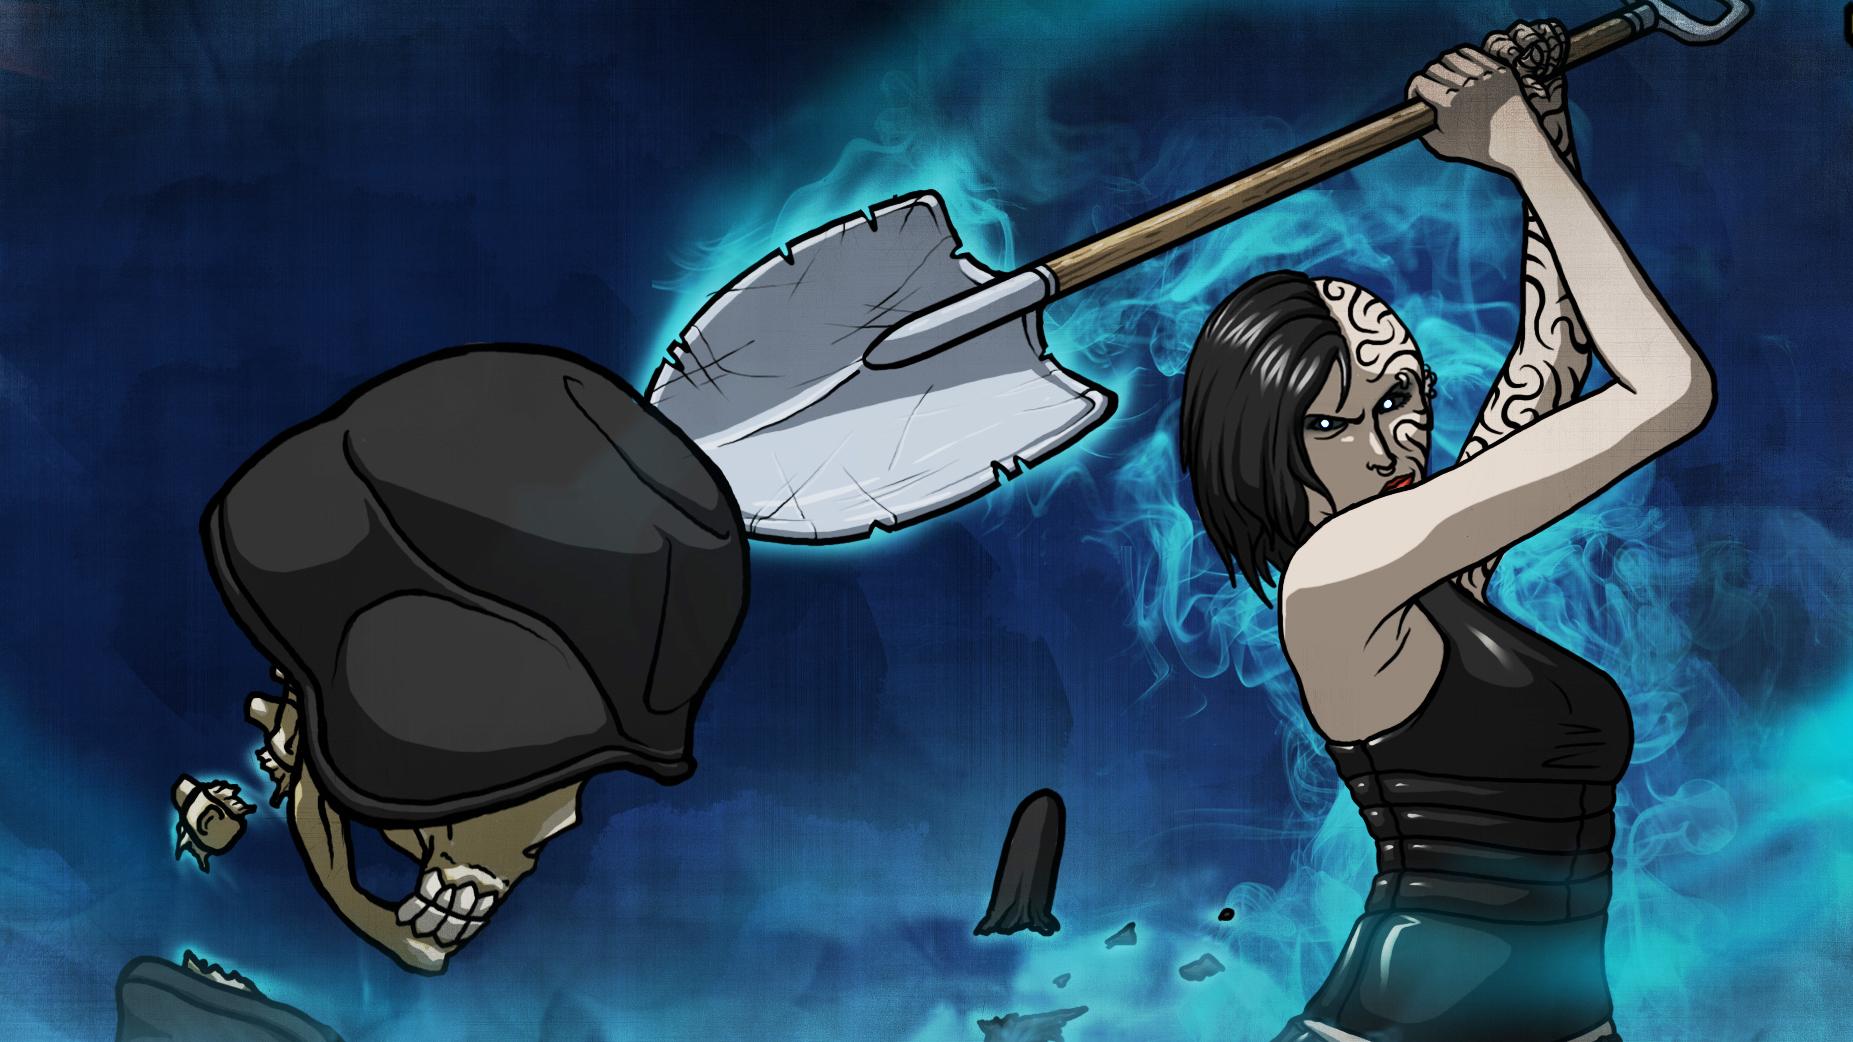 Hela: The Grave Digger